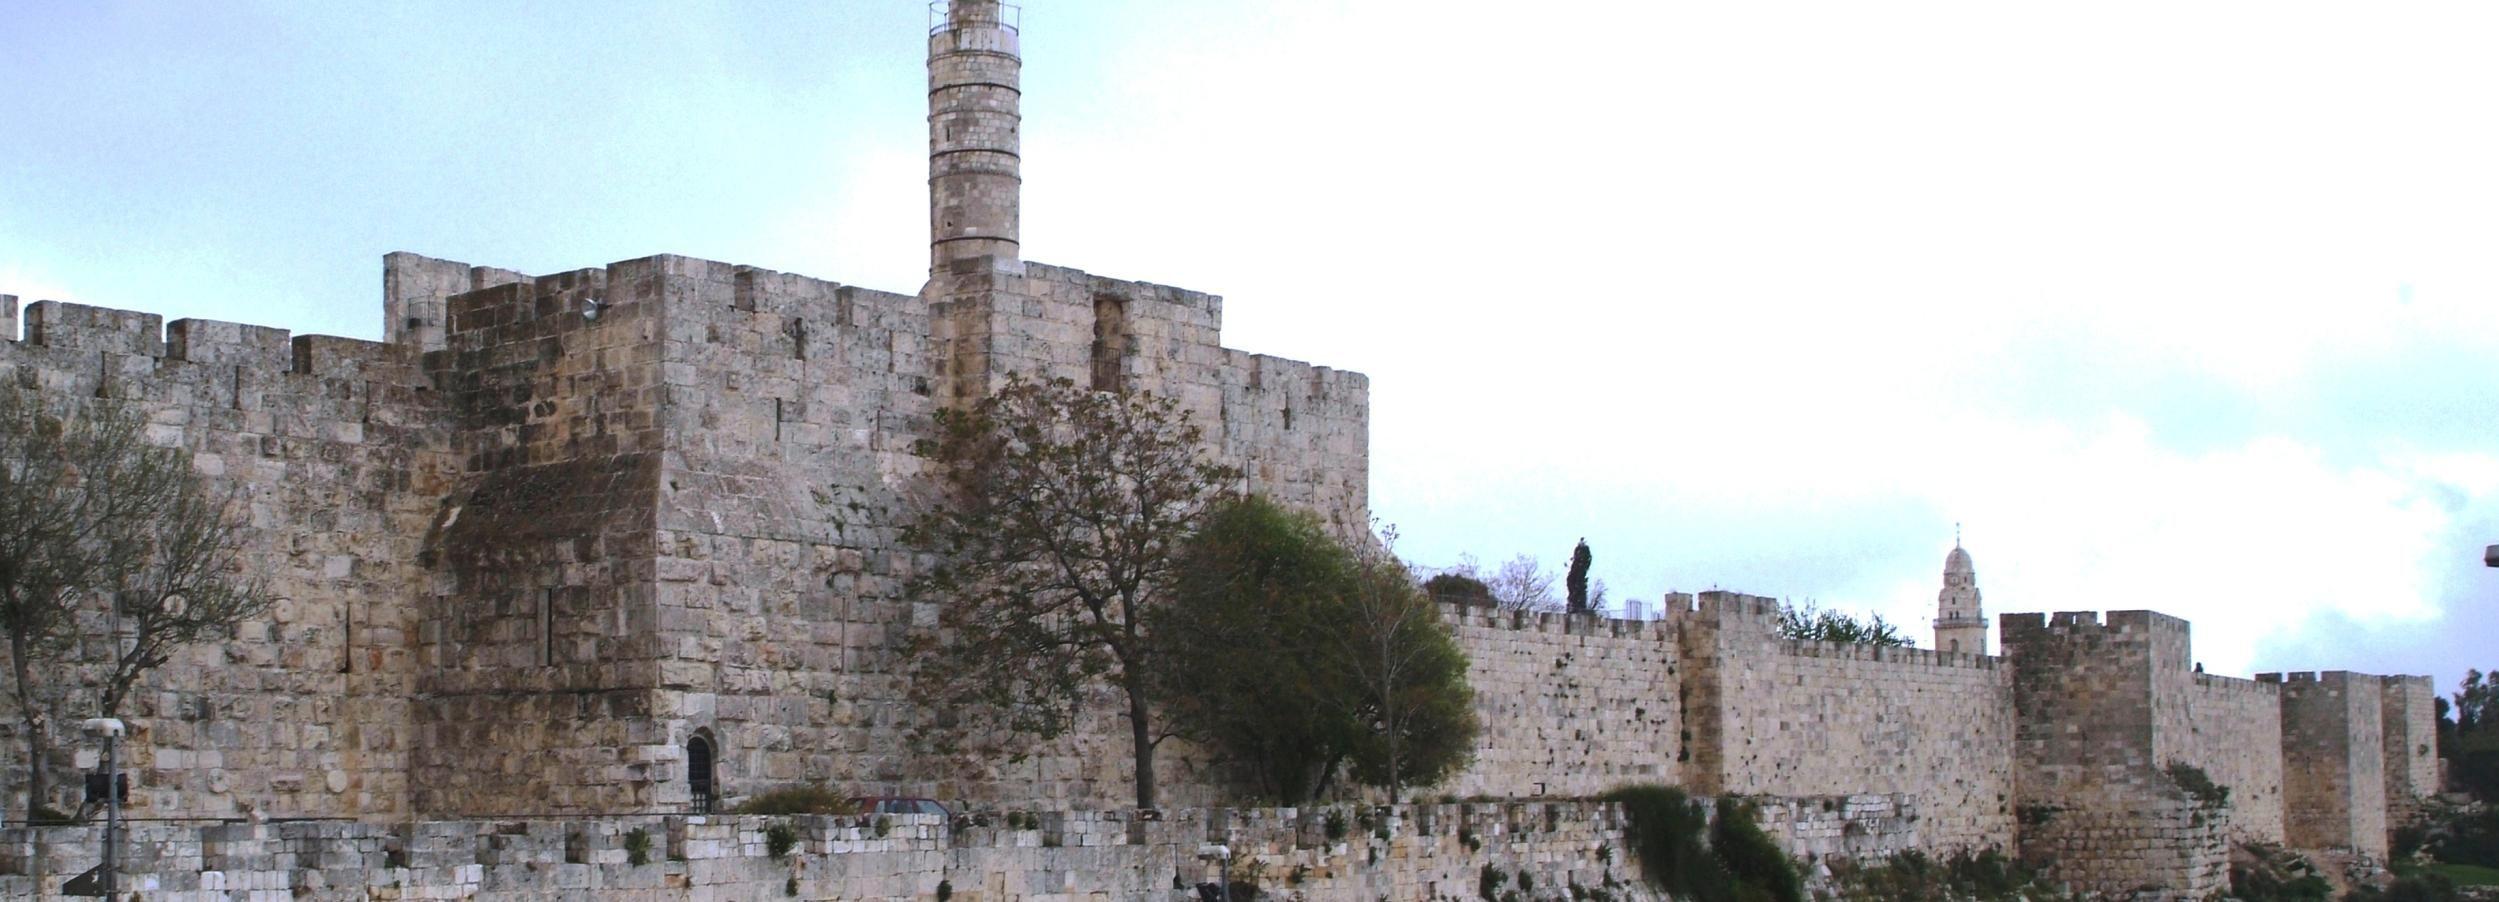 Gerusalemme cristiana: tour privato